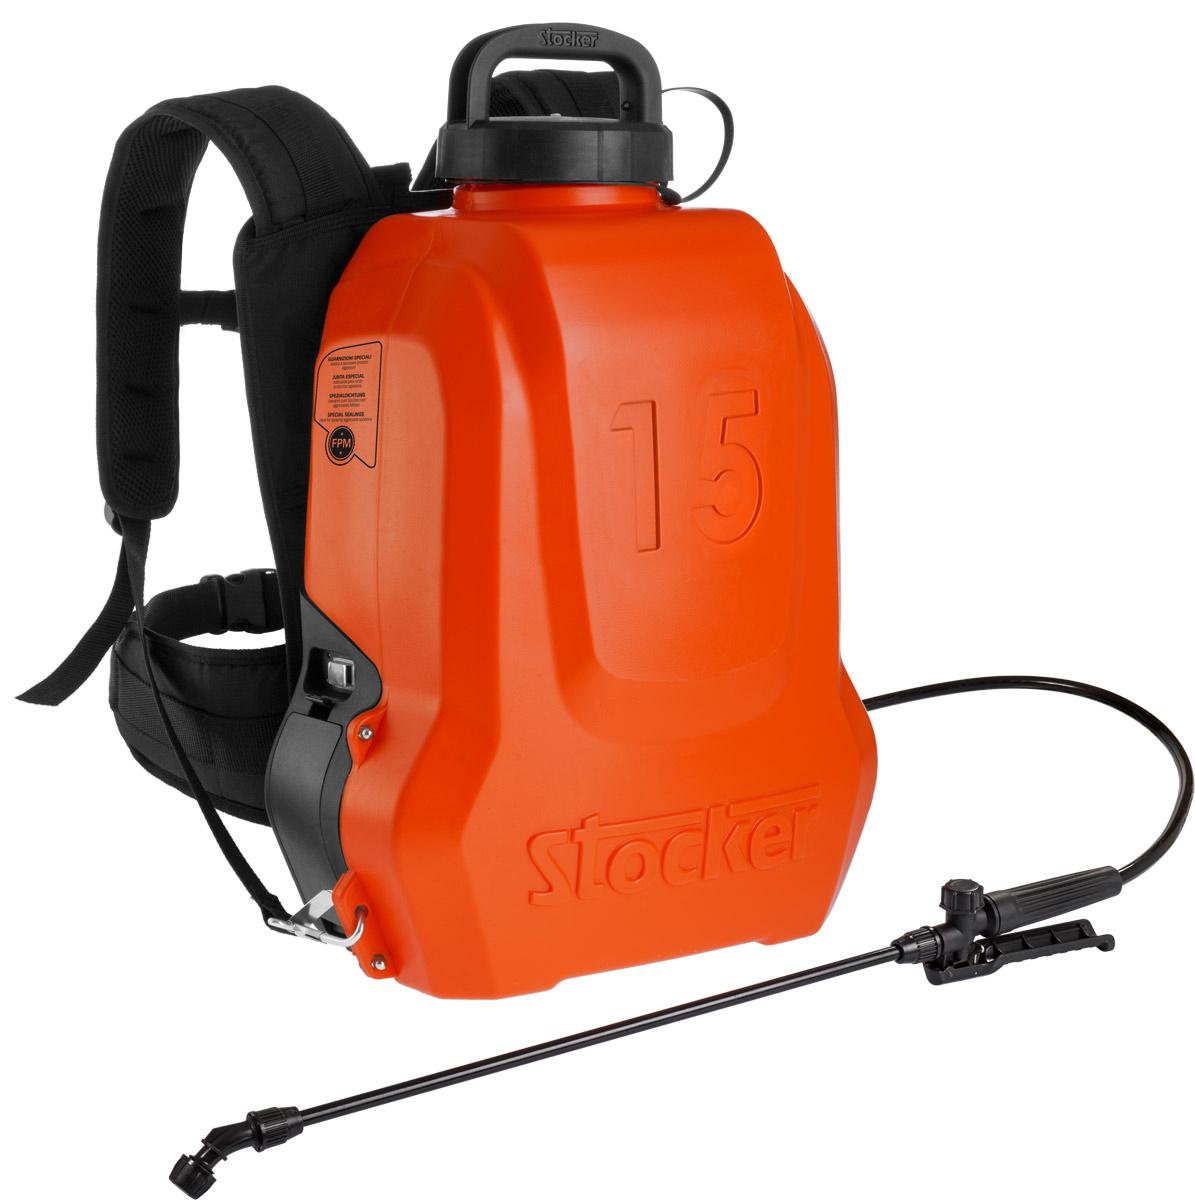 Pompa zaino elettrica Ergo15 l Li-Ion FPM 5bar